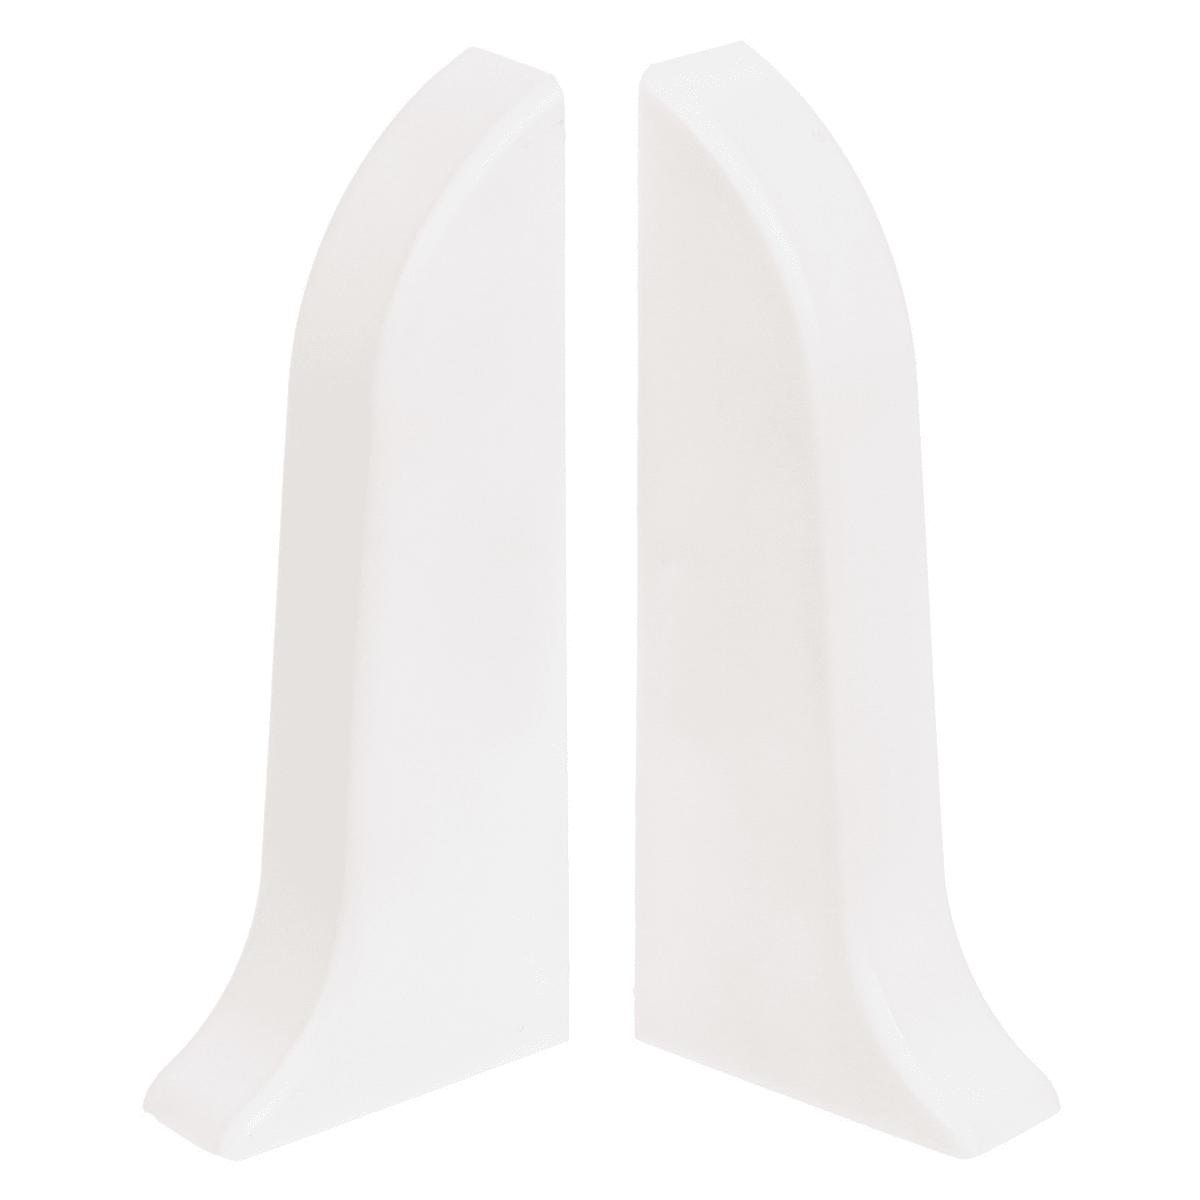 Заглушка для плинтуса левая и правая, 55 мм, цвет белый